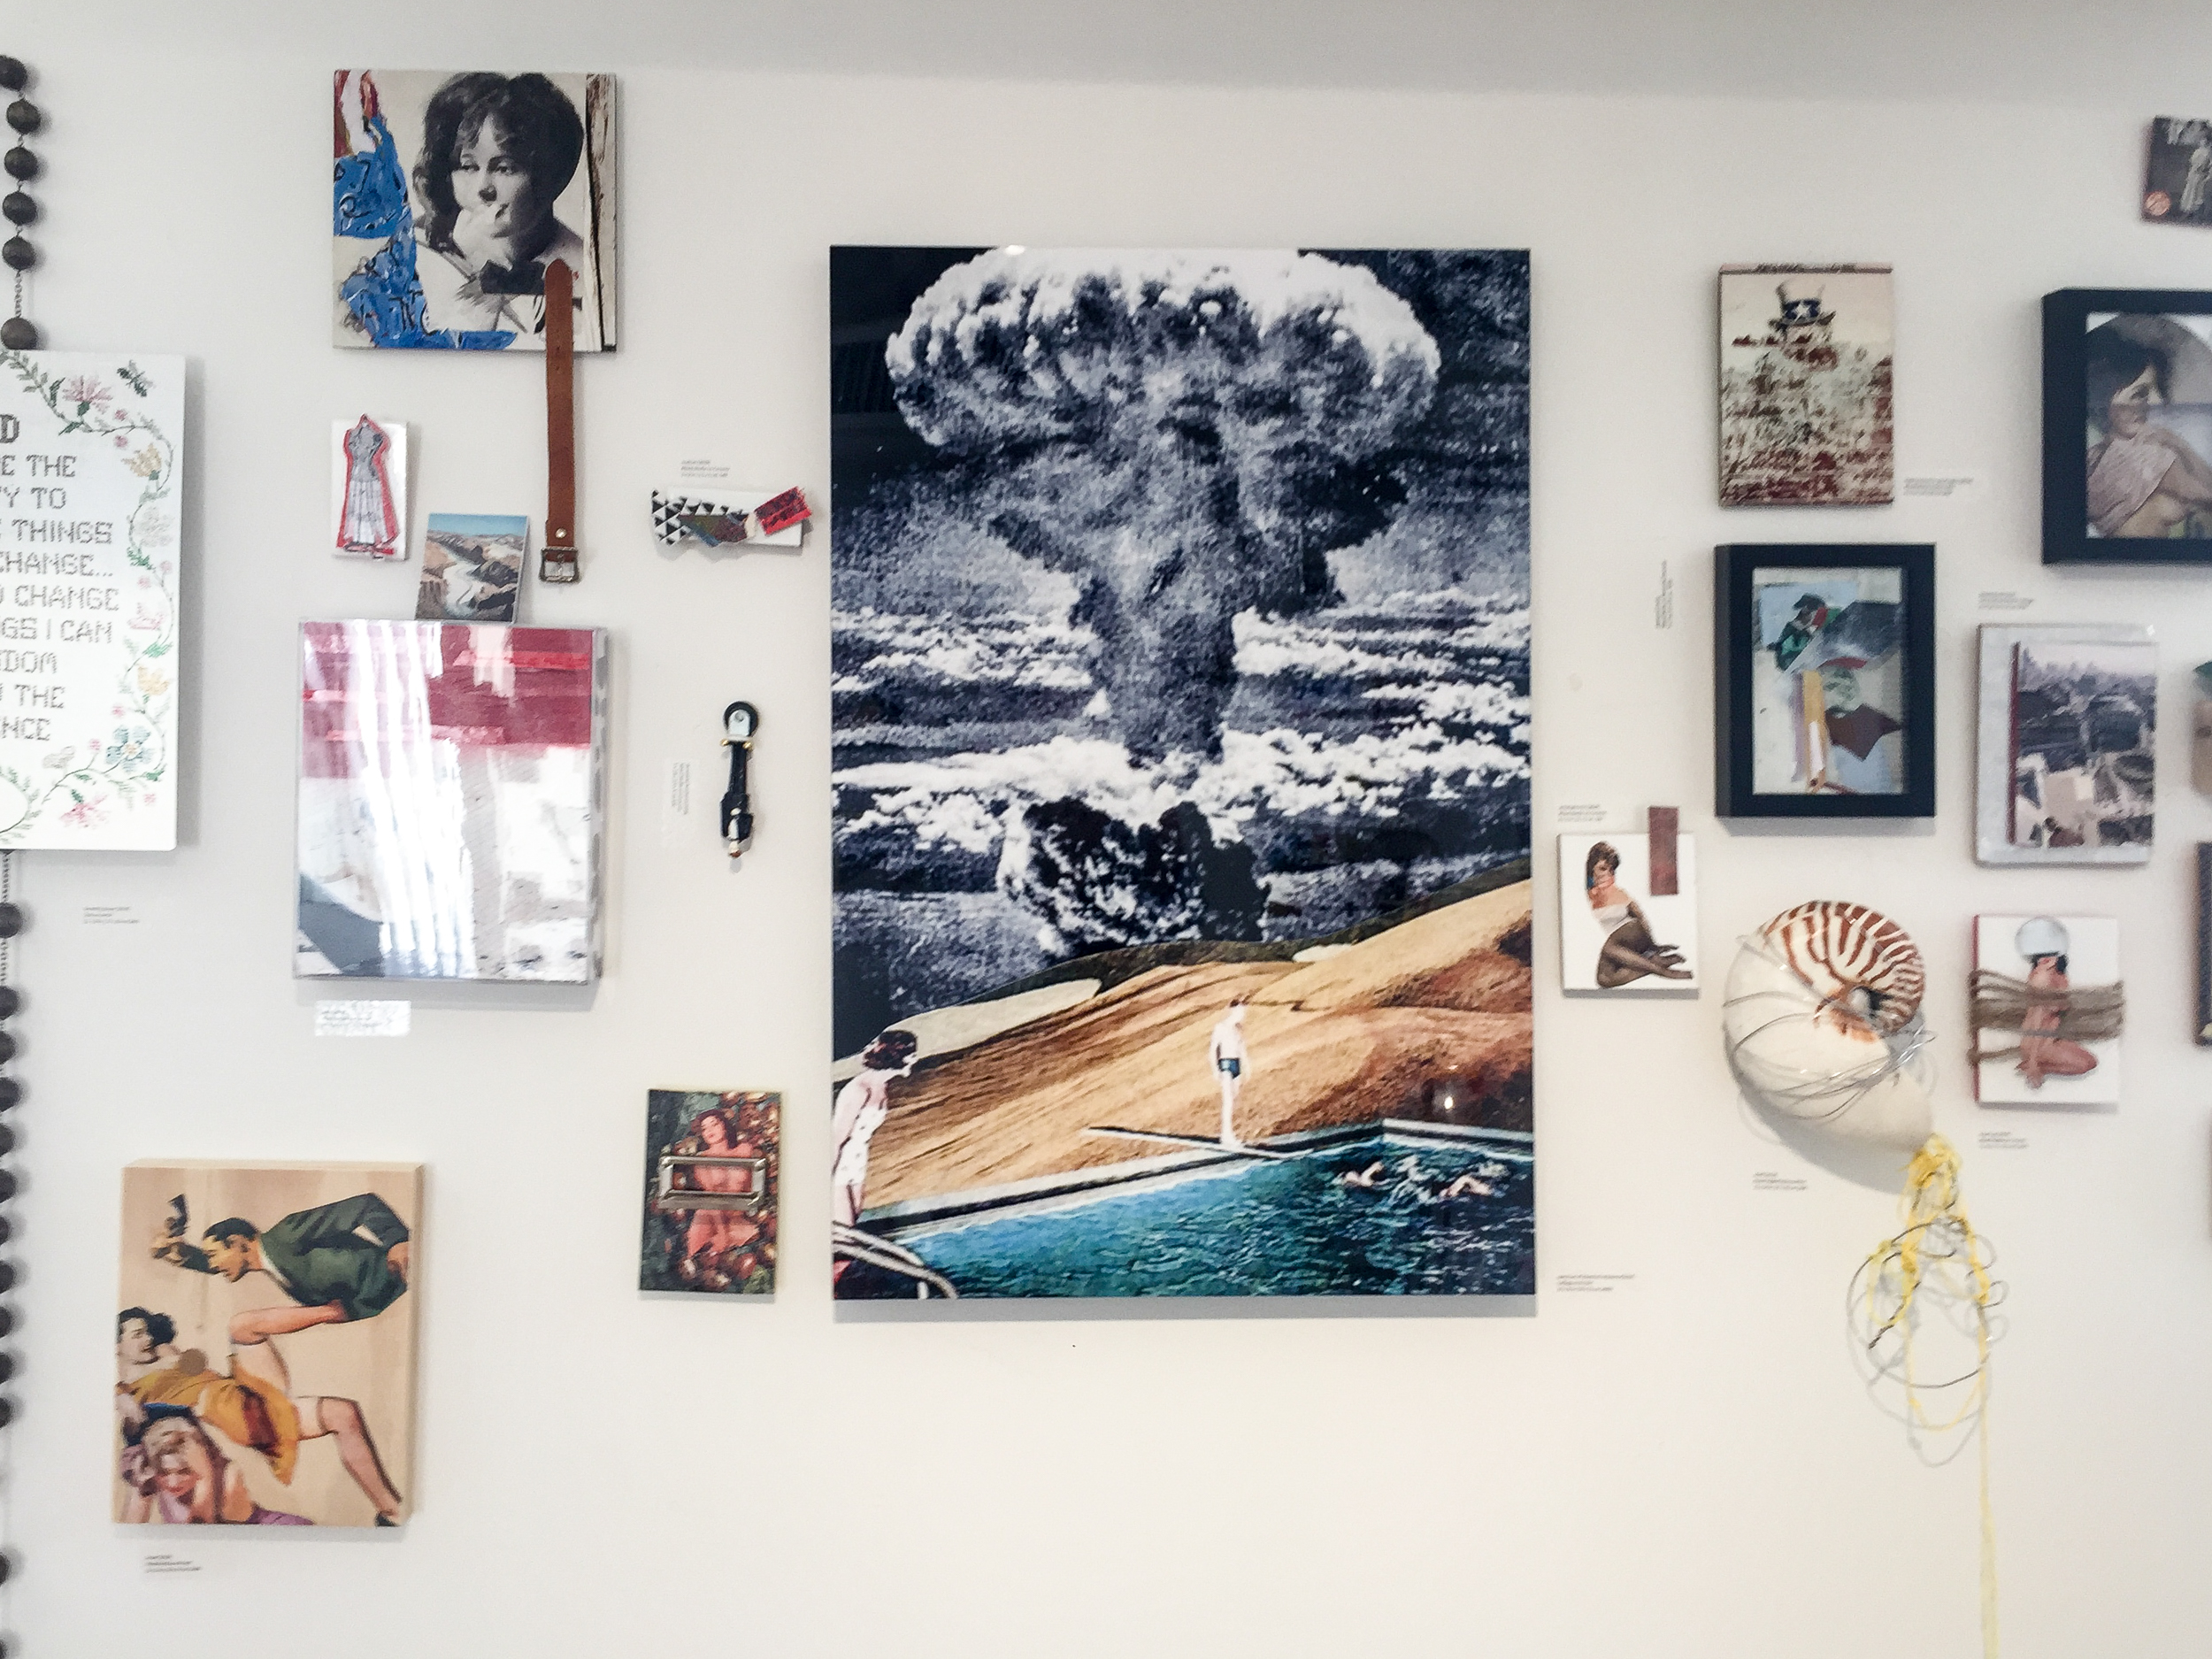 Faena-Exhibition-Images-95.jpg